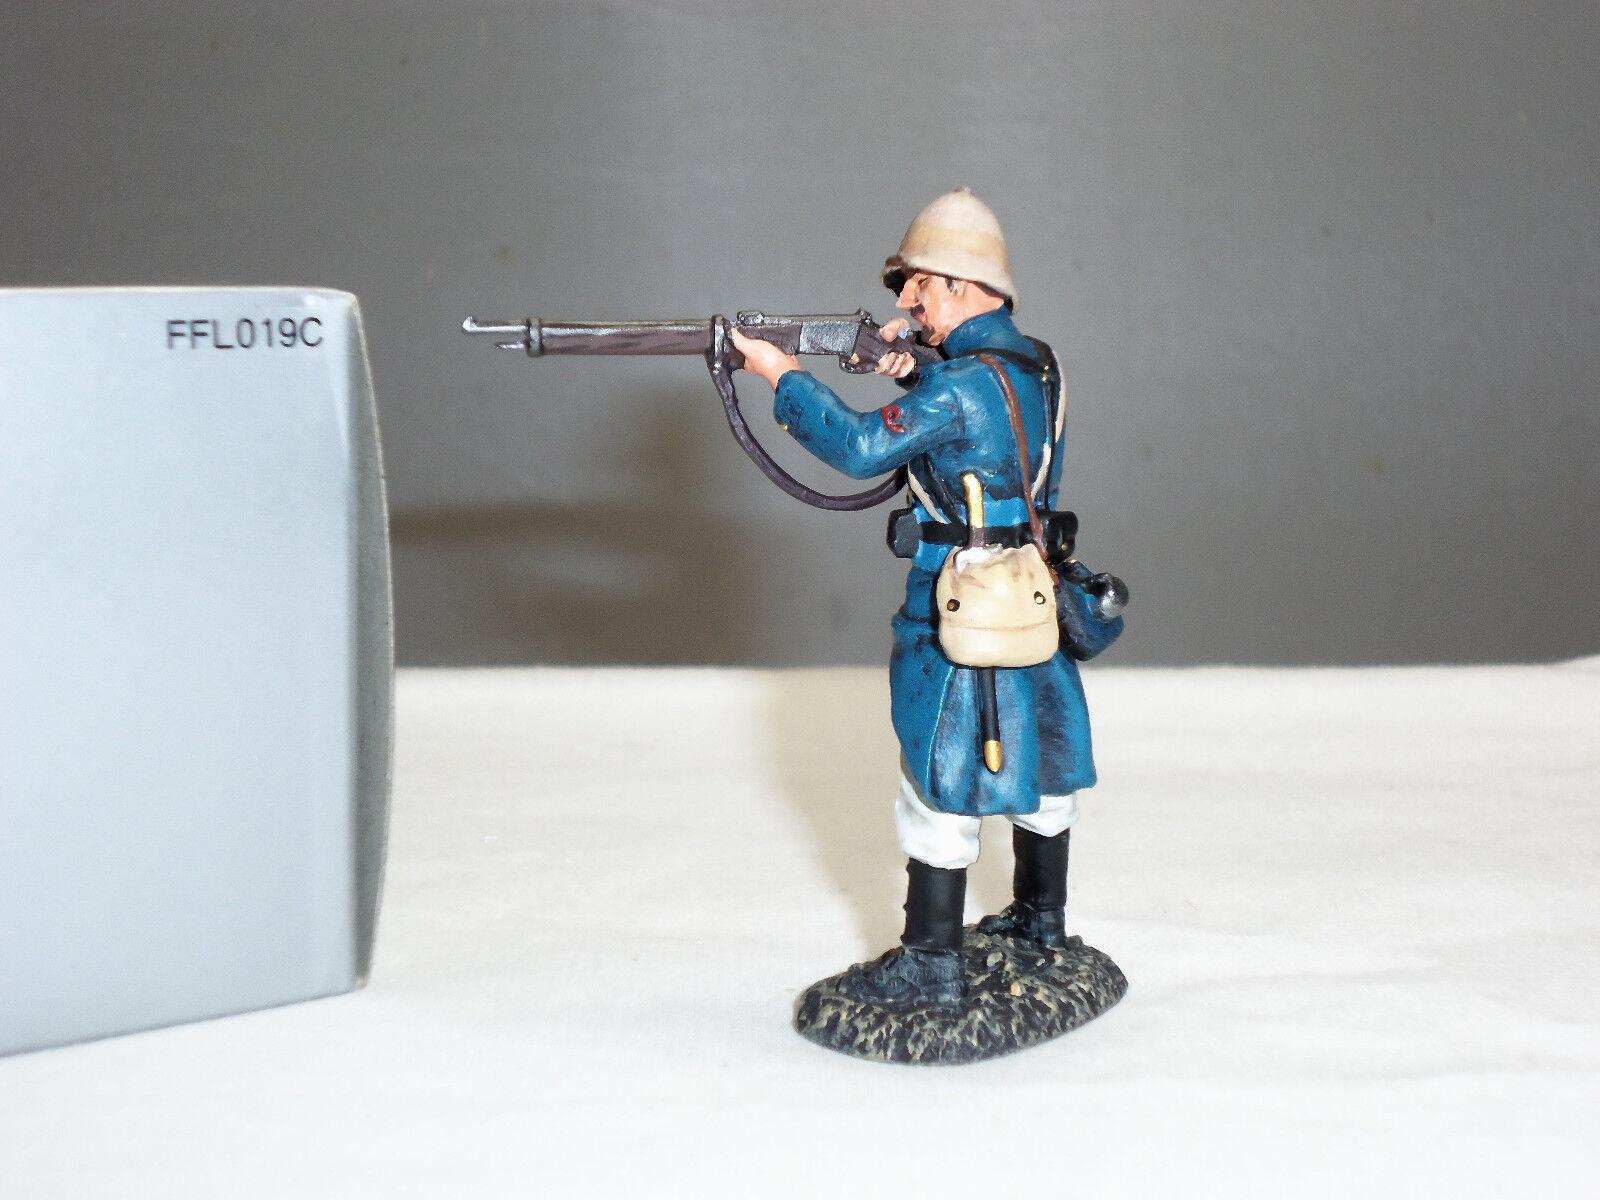 THOMAS GUNN FFL019C FRENCH FOREIGN LEGION LEGIONNAIRE STANDING FIRING PITH HAT